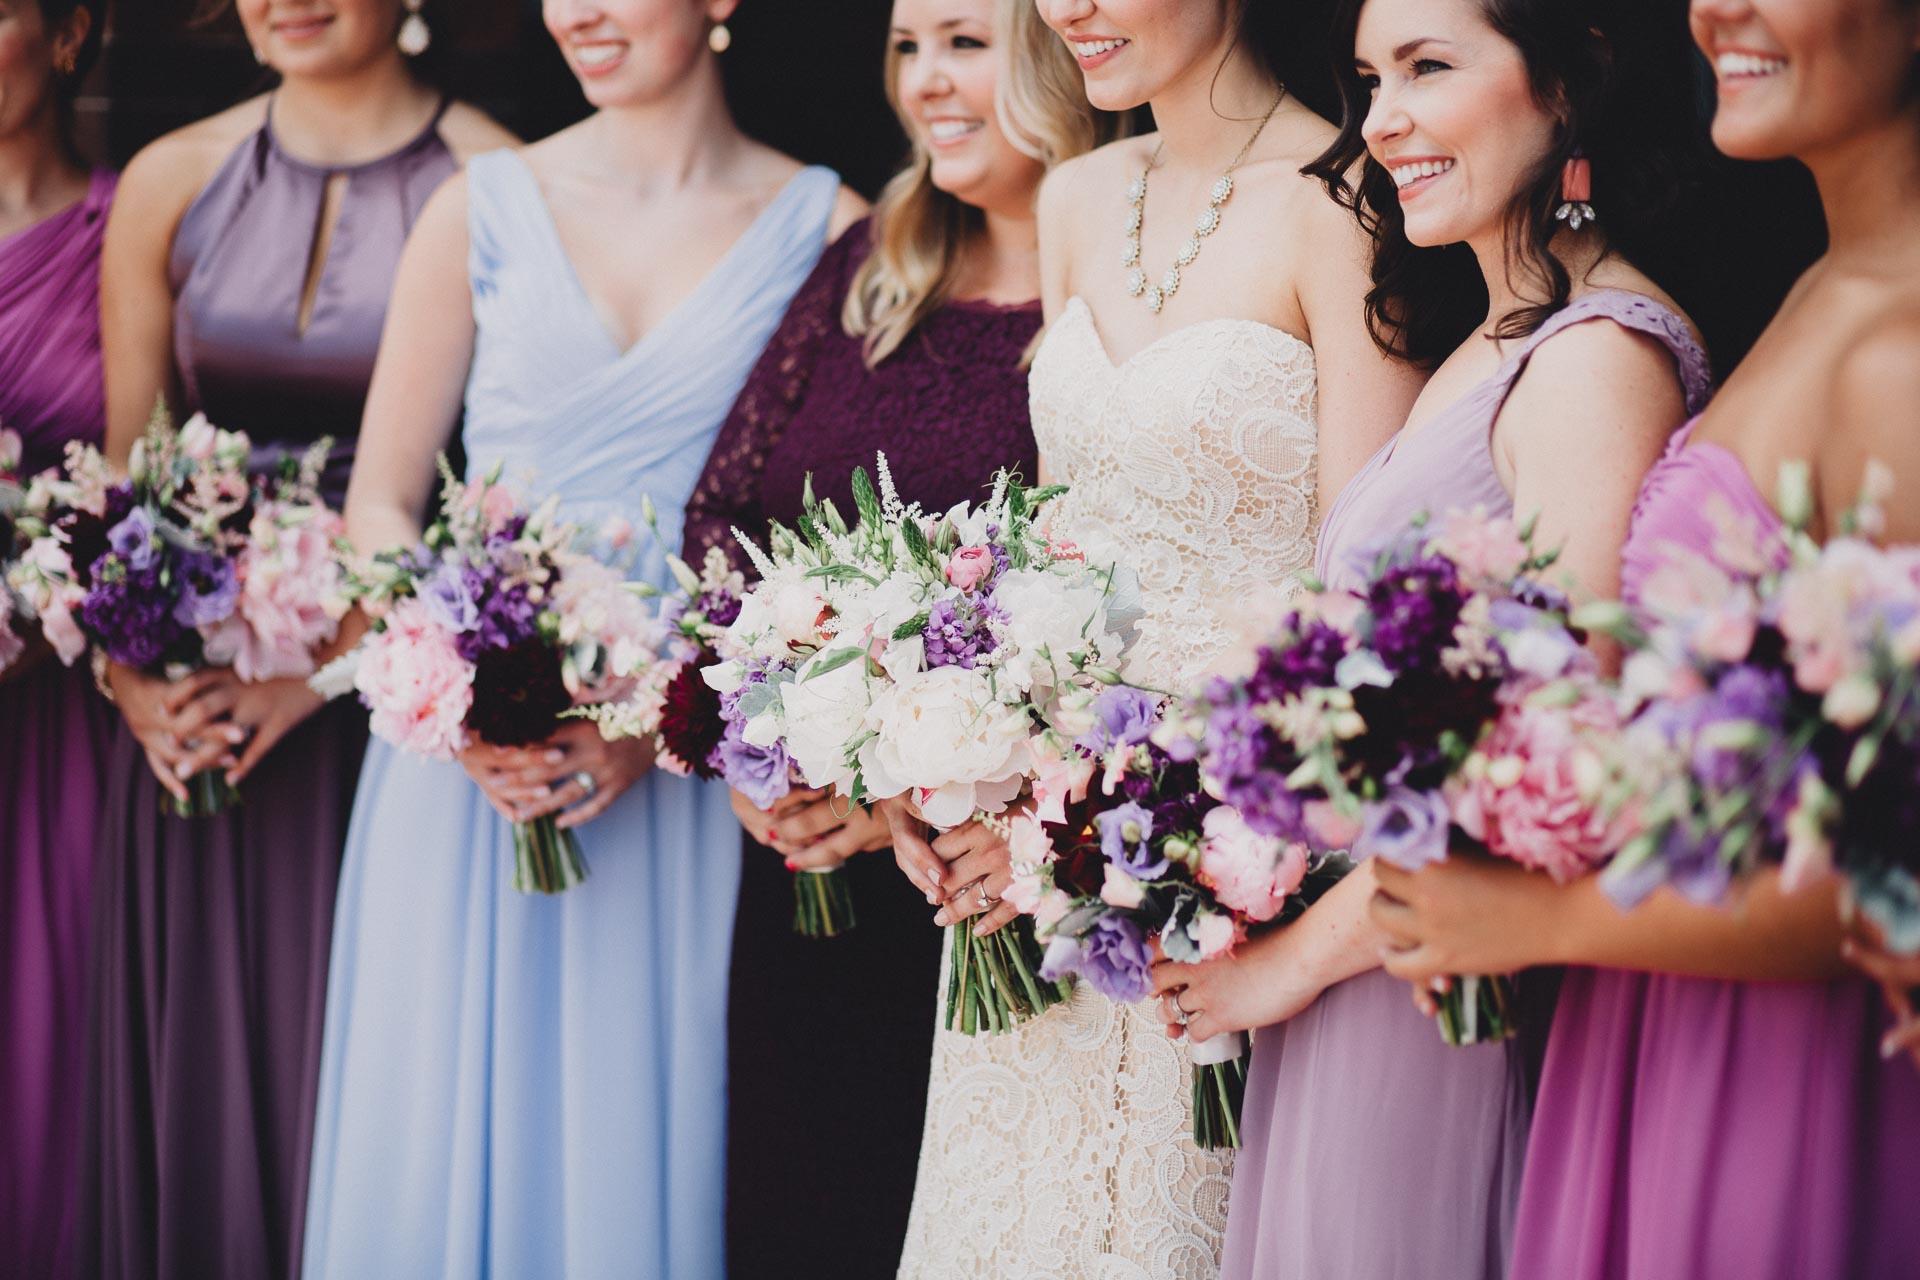 Julia-Michael-Cincinnati-Music-Hall-Wedding-050@2x.jpg